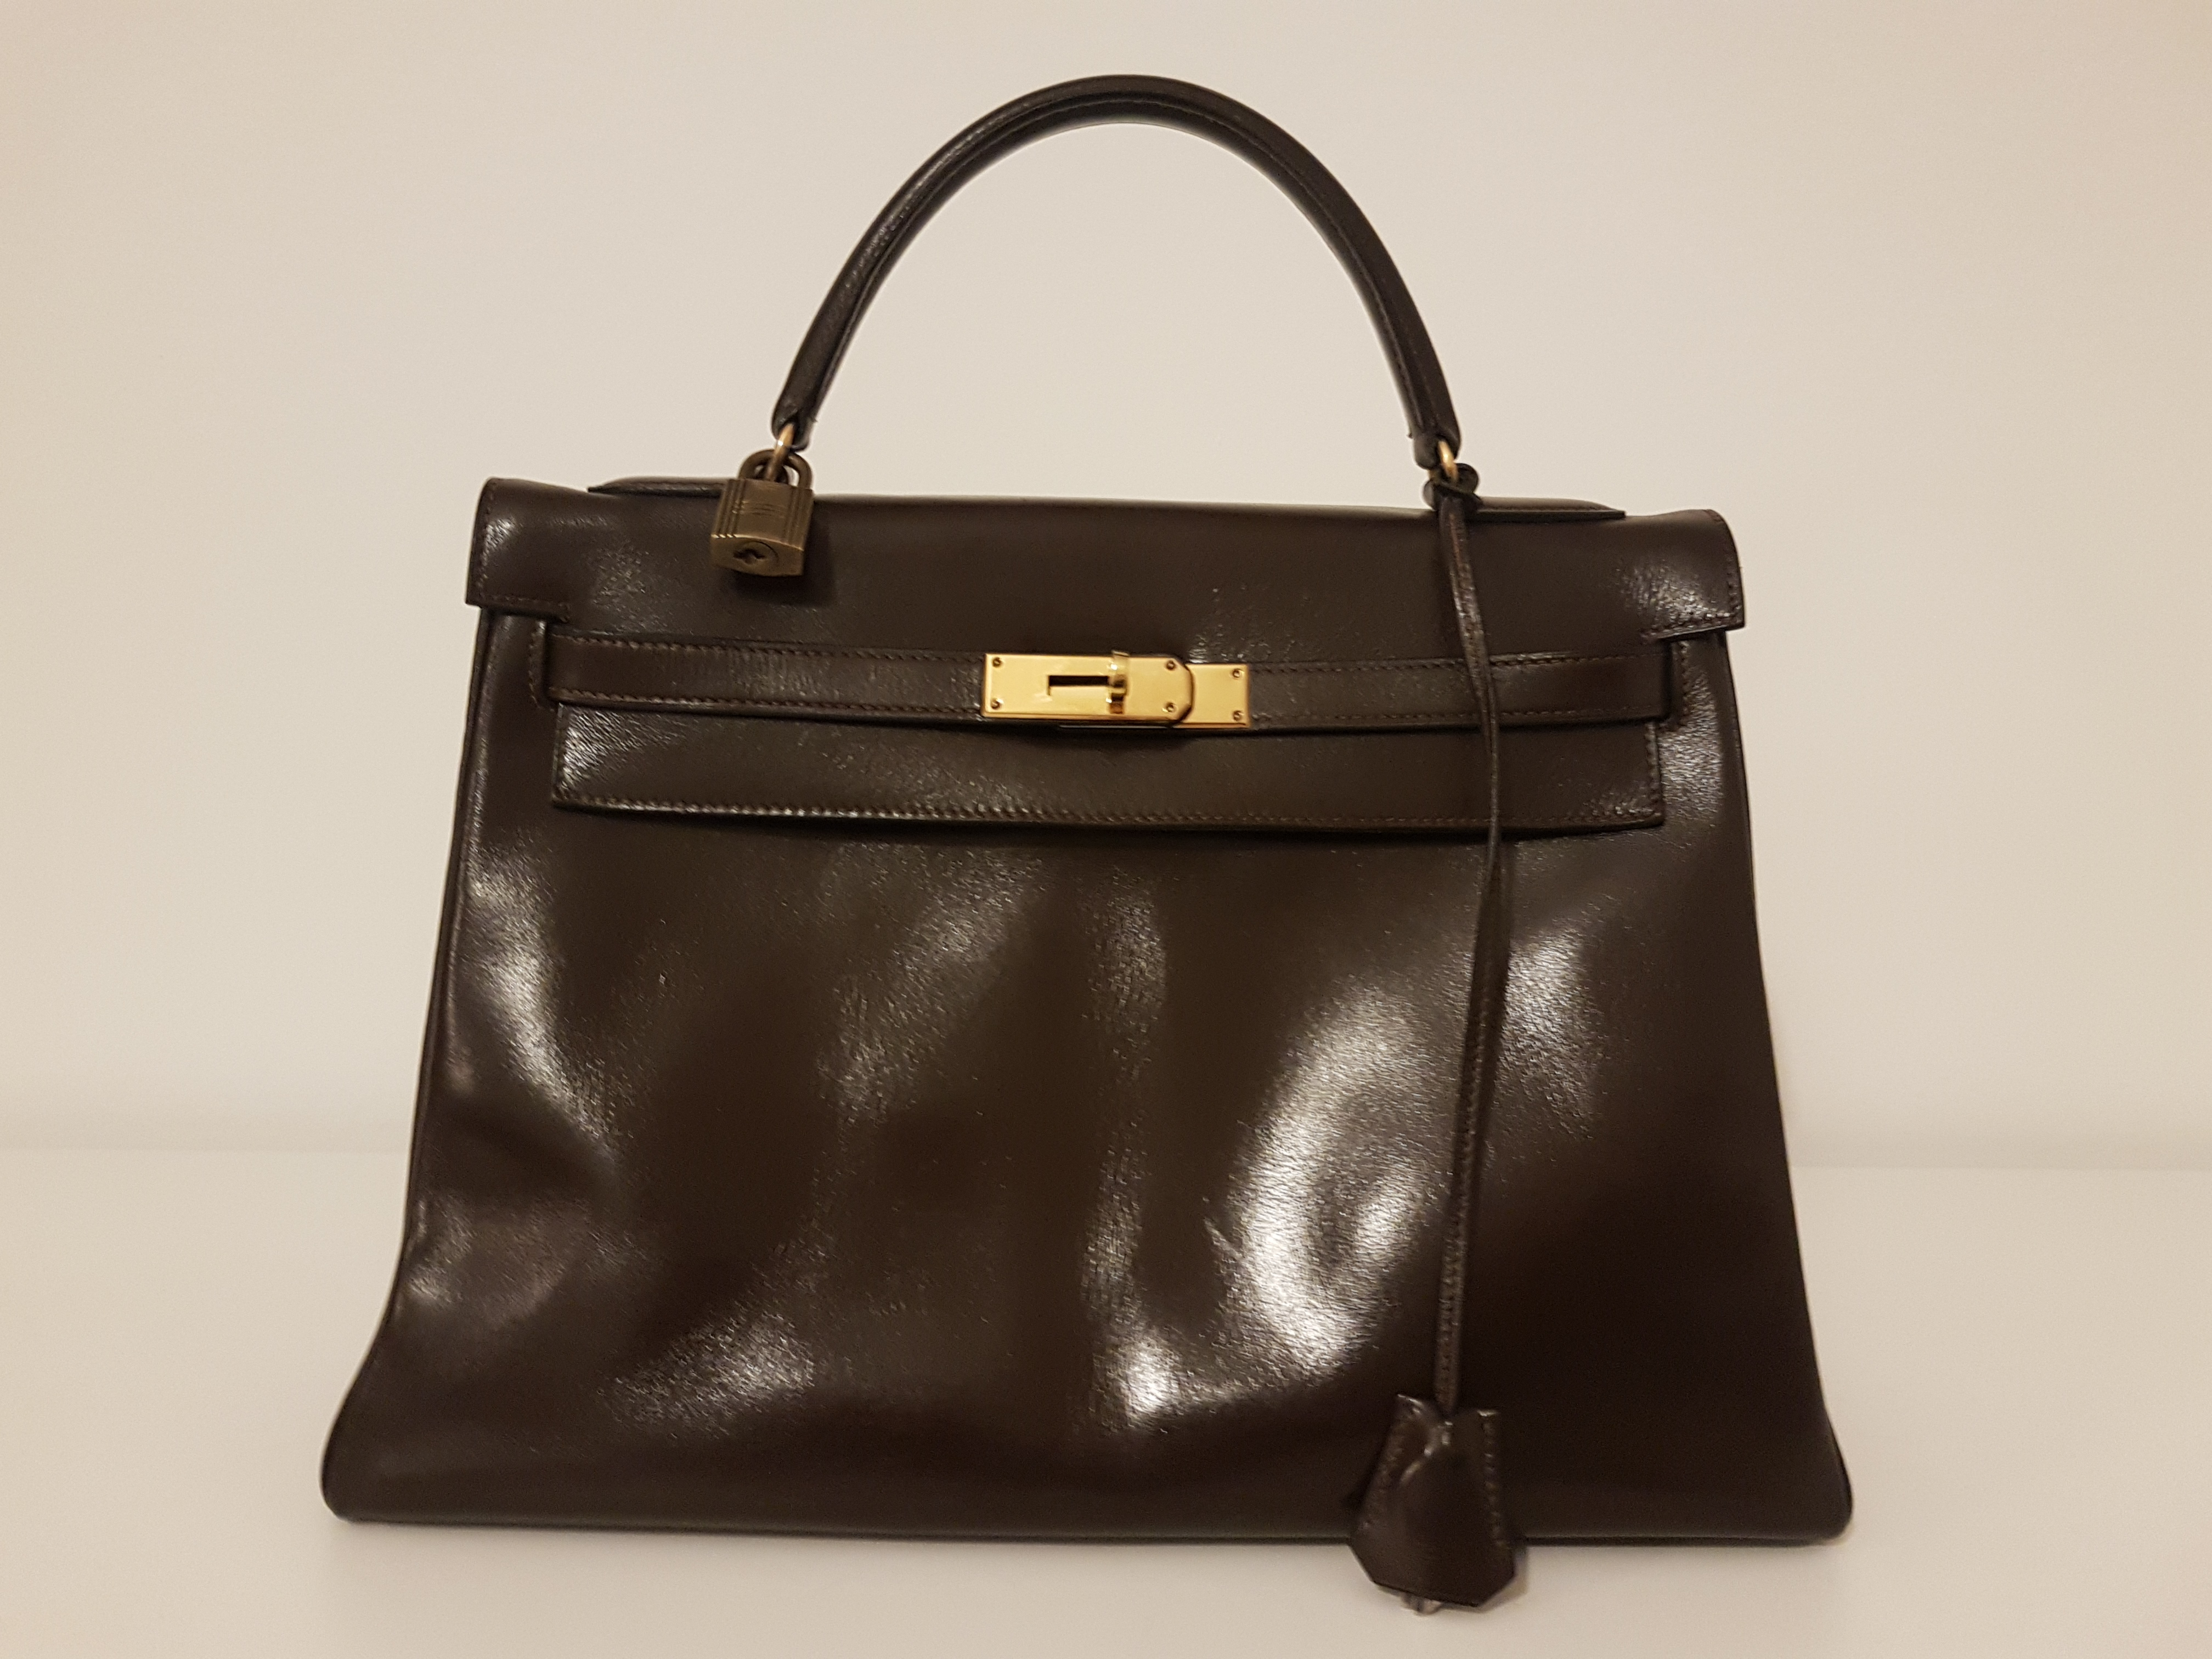 "Lot 57 - Handbag from Hermes, model ""Kelly 32"", bag in brown leather, Padlocks & bells & keys [...]"